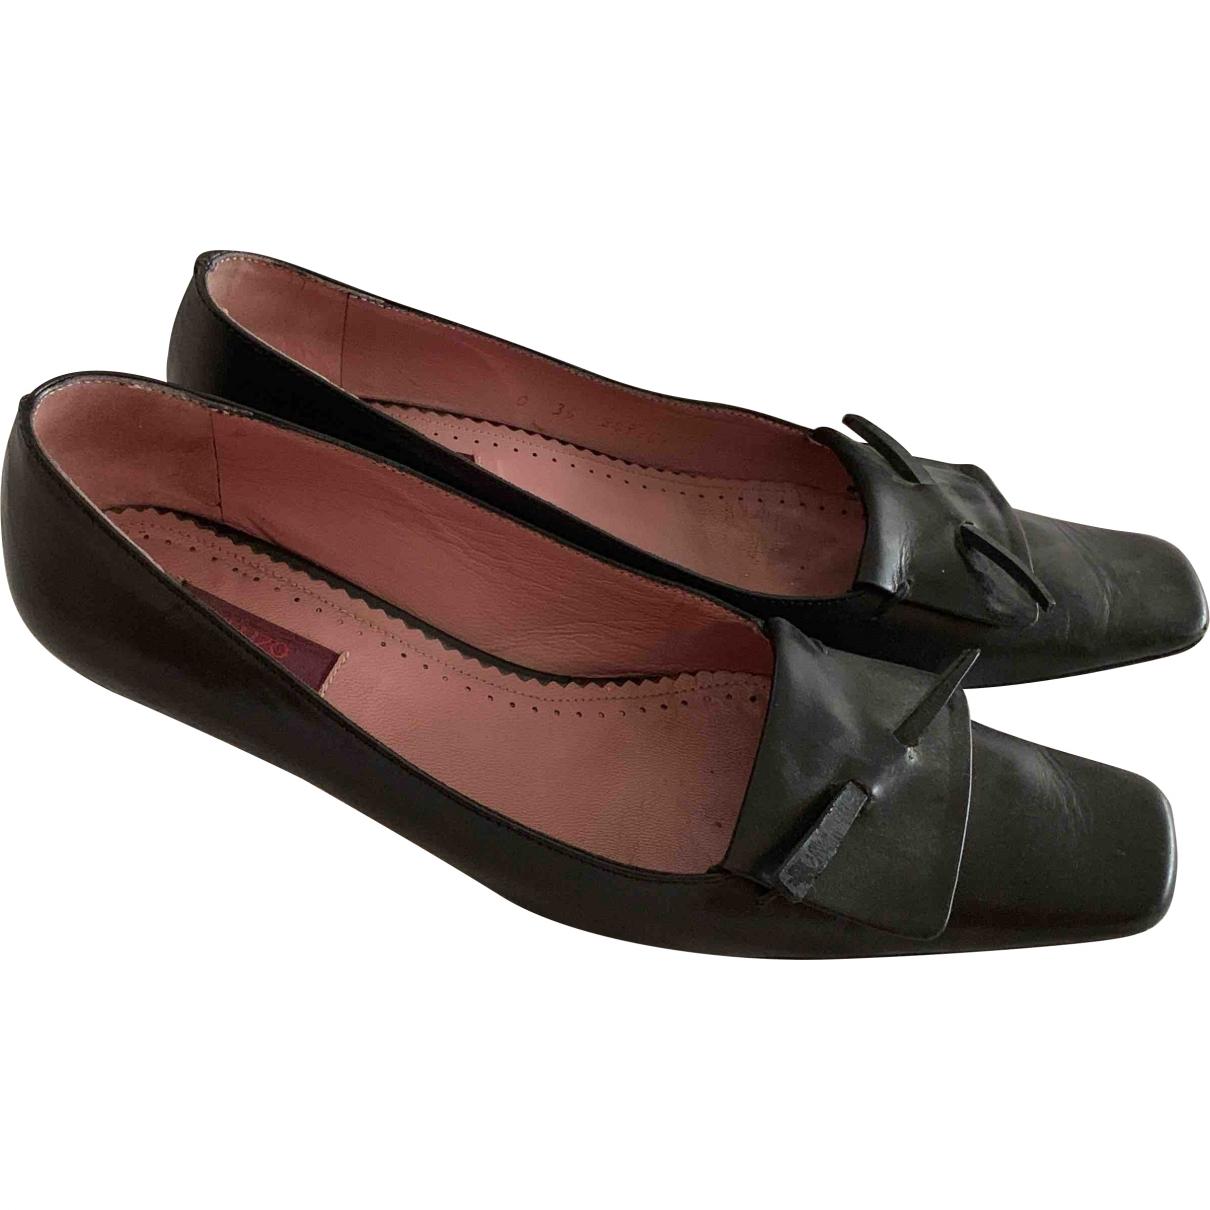 Kenzo \N Brown Leather Heels for Women 36 EU